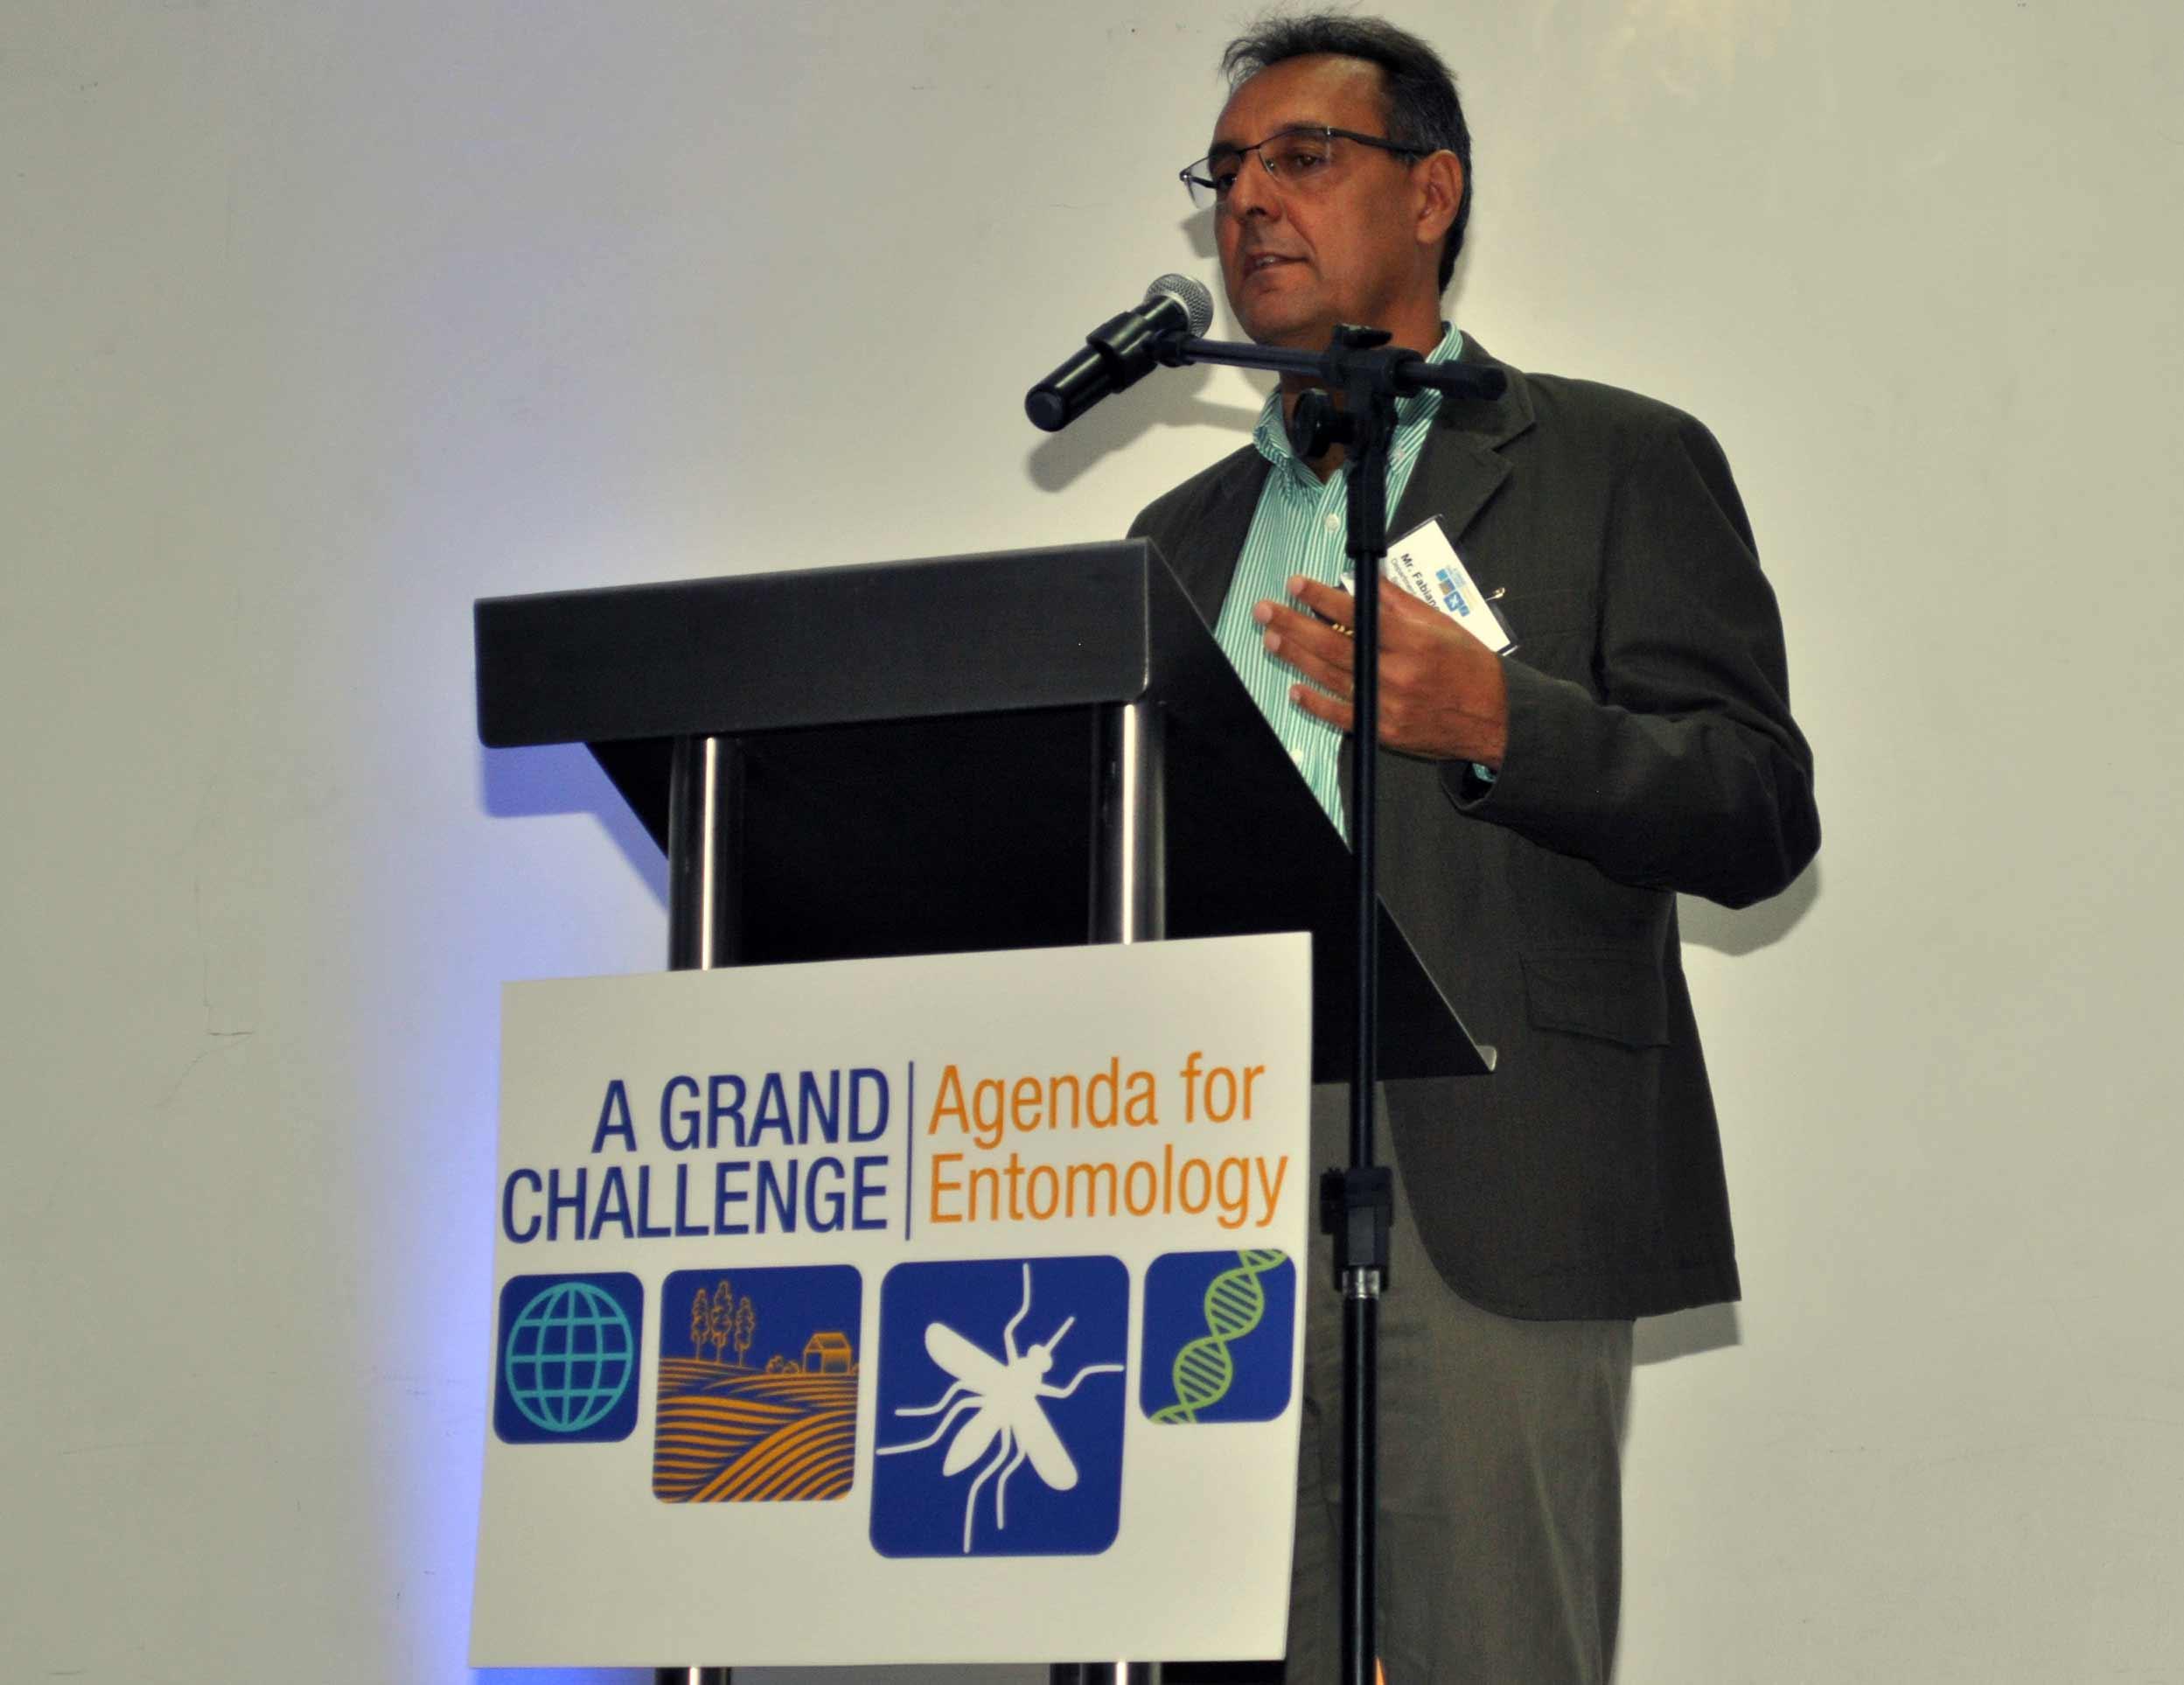 Fabiano Pimenta, Secretaria Municipal Saude, Belo Horizonte, BH, Brazil.